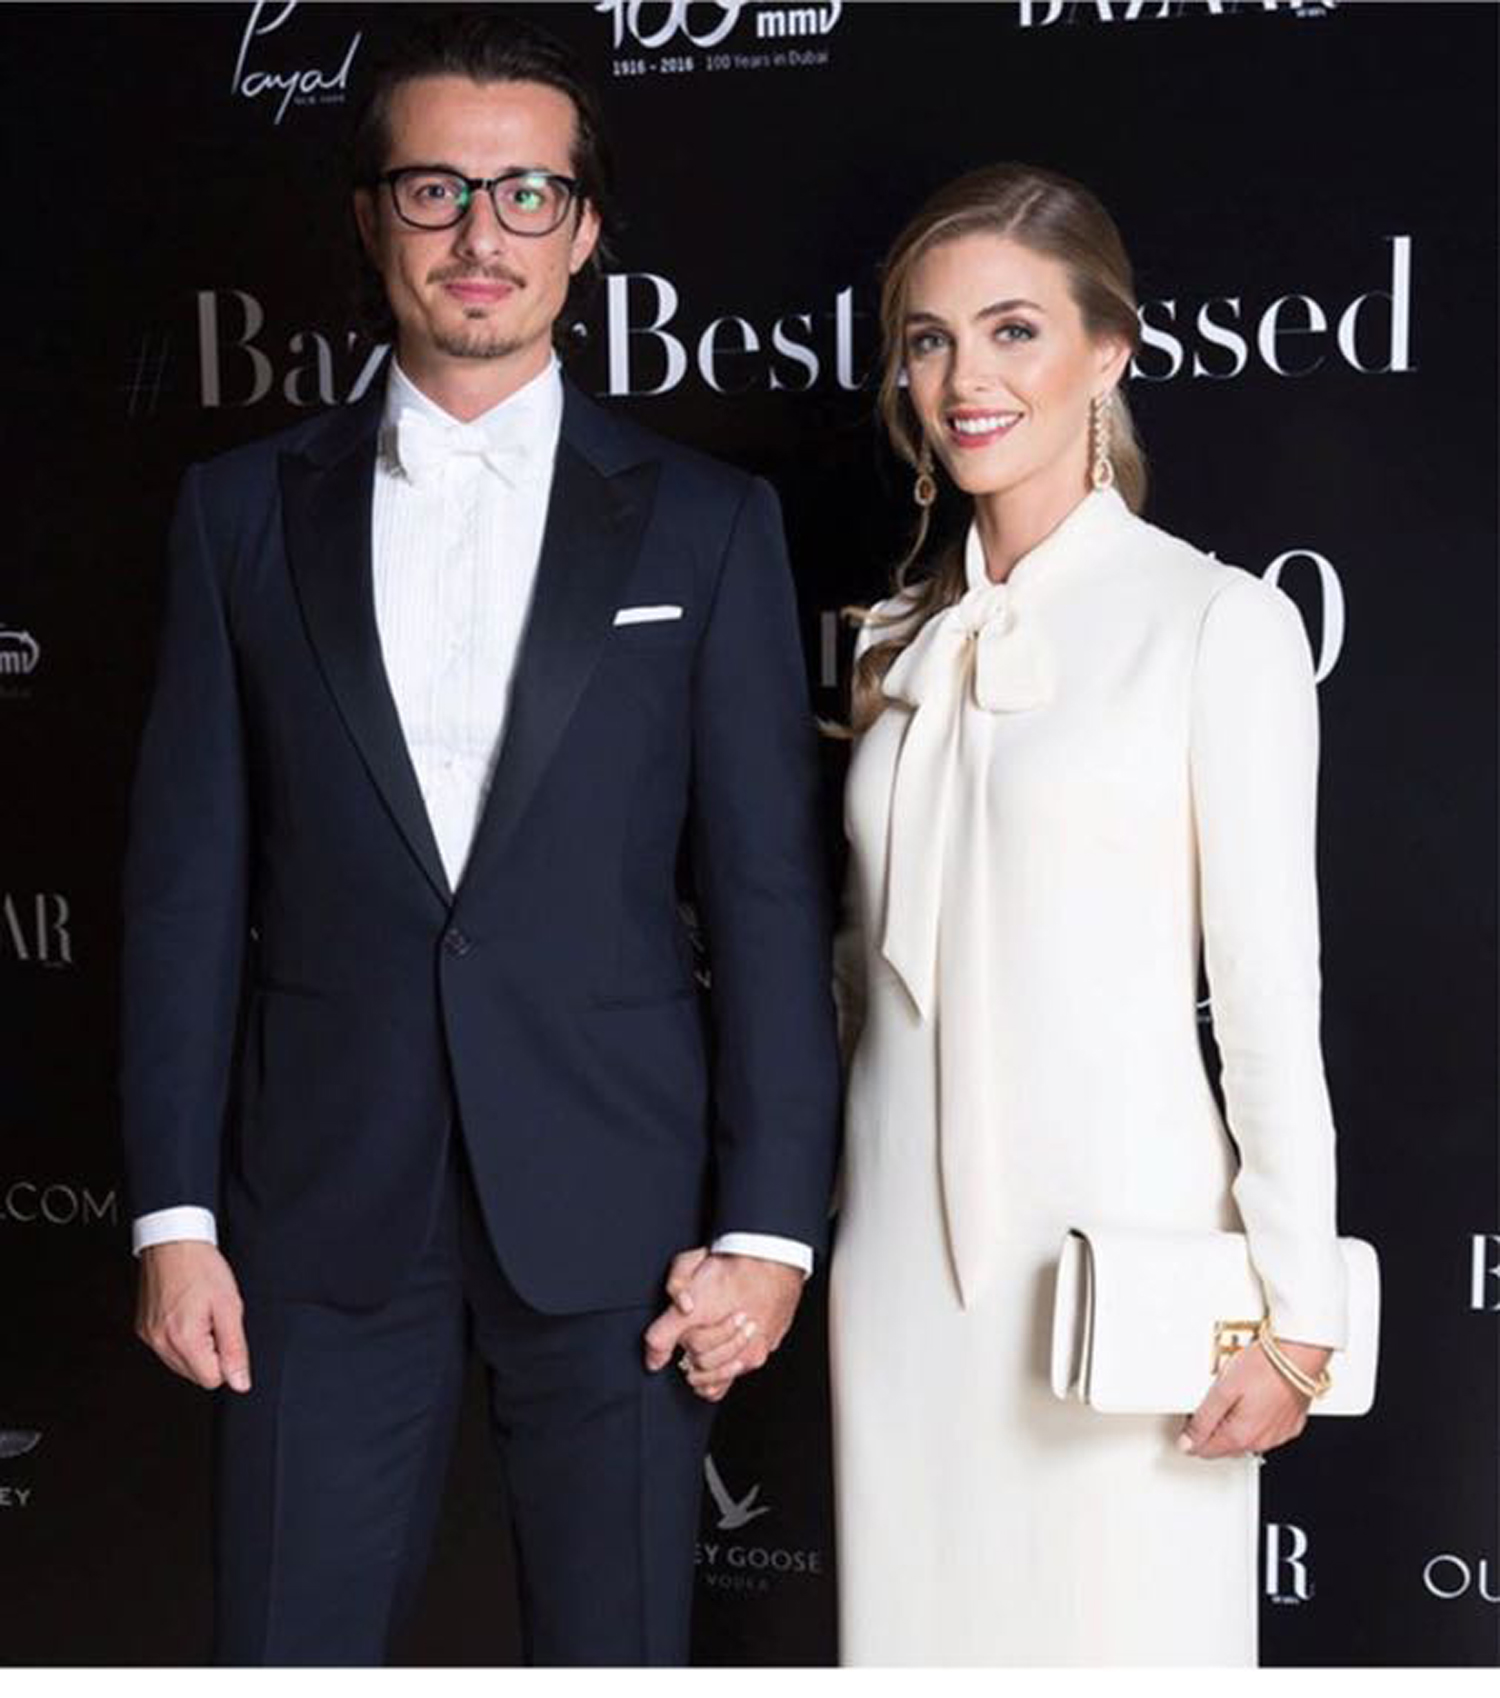 صورة ليندي لوهان وساندي تتألقان في حفل Harper's Bazar Arabia